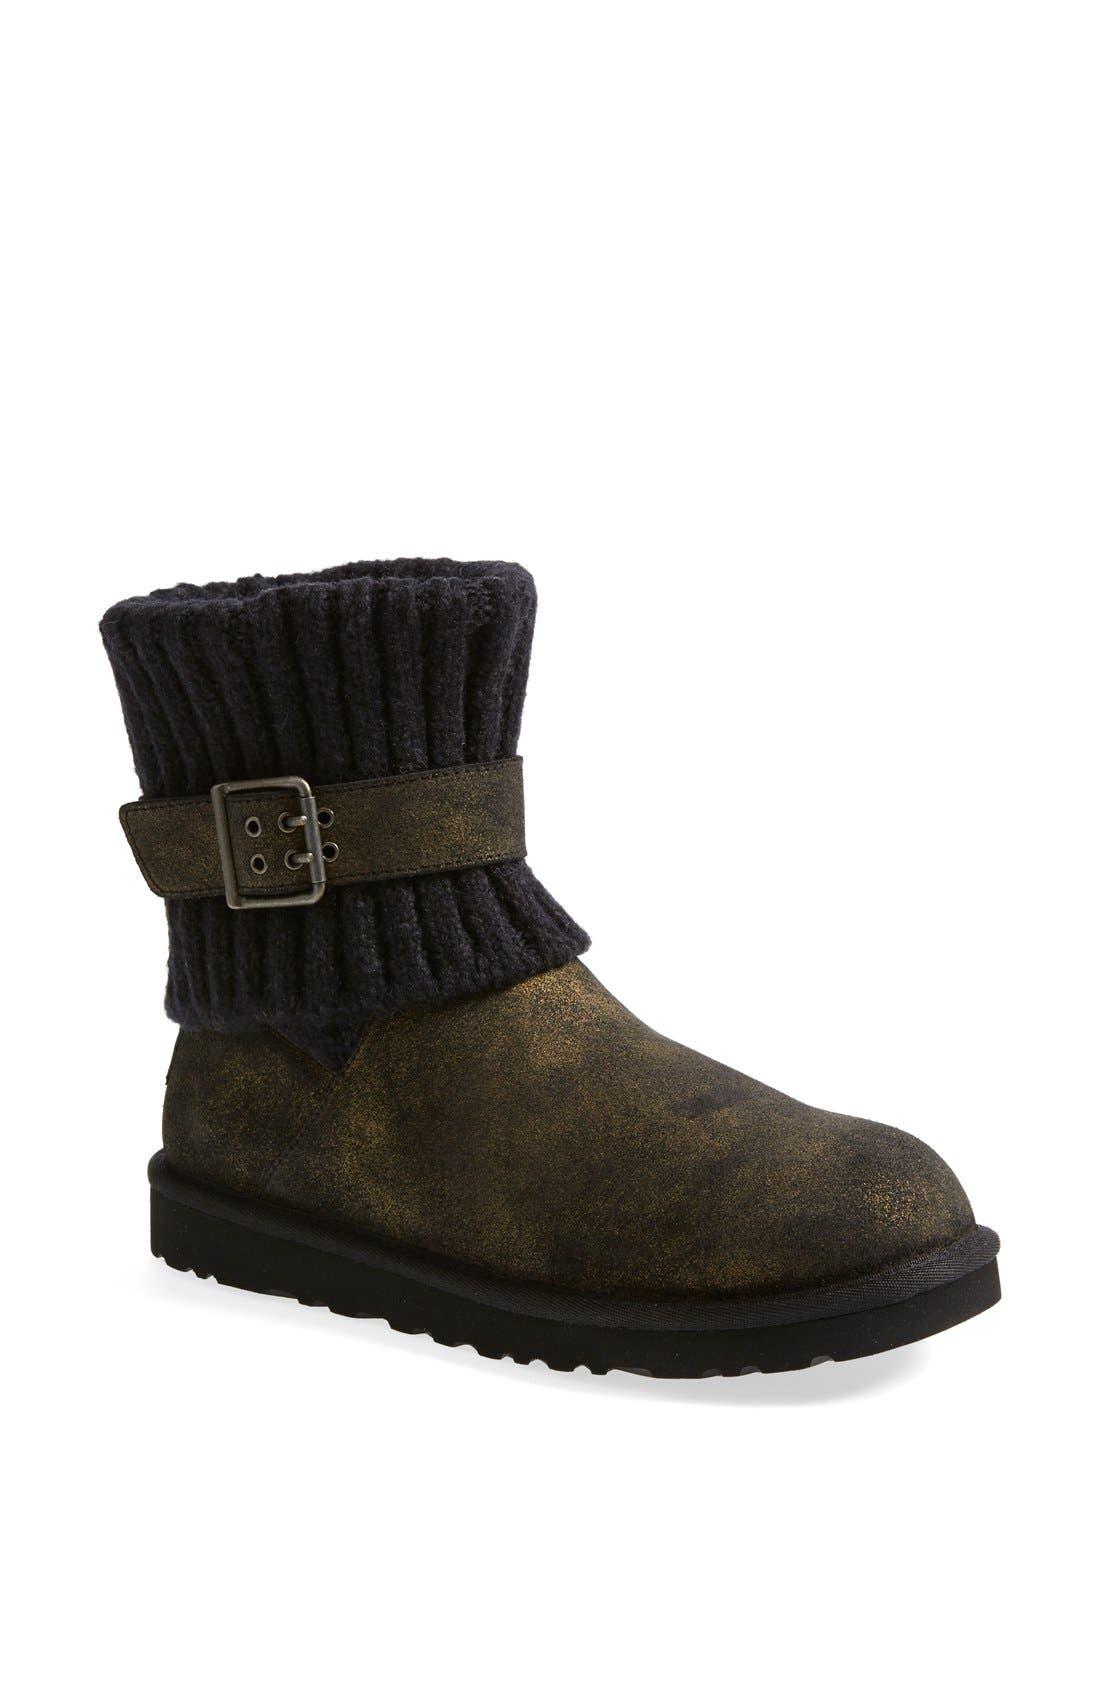 Alternate Image 1 Selected - UGG® Australia 'Cambridge' Boot (Women)